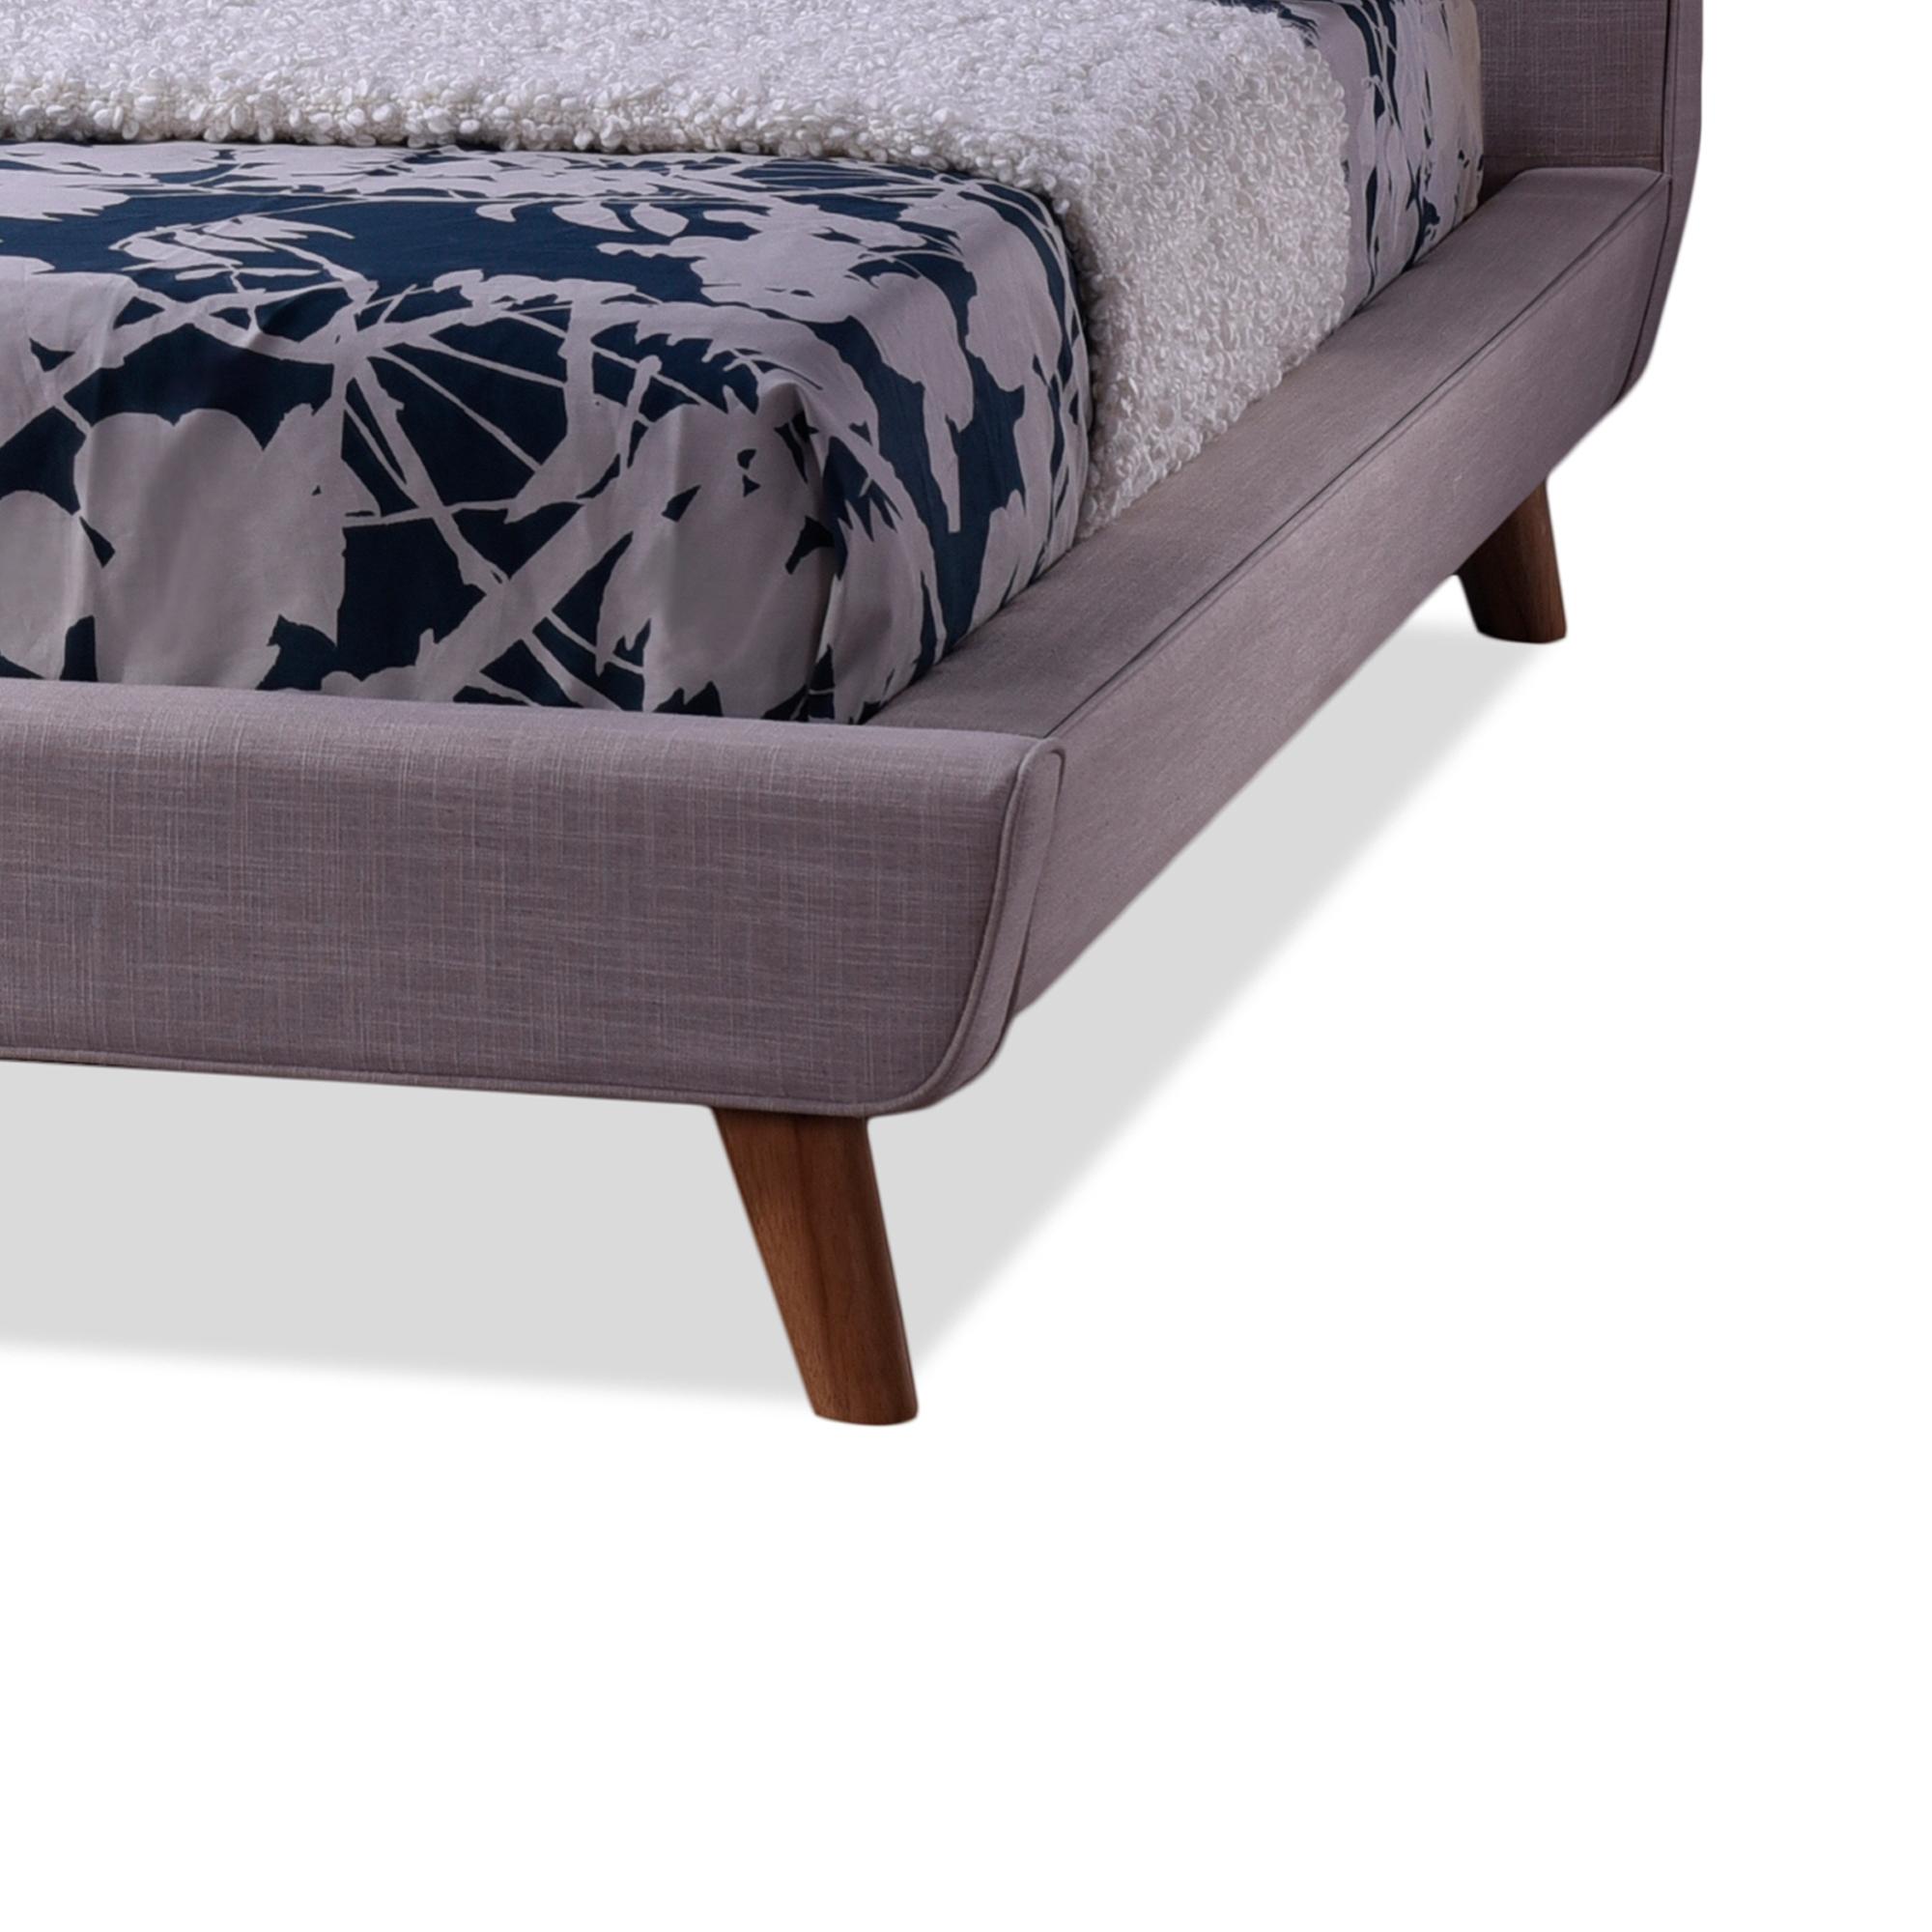 baxton studio jonesy style midcentury beige fabric upholstered king size platform bed - Upholstered Platform Bed